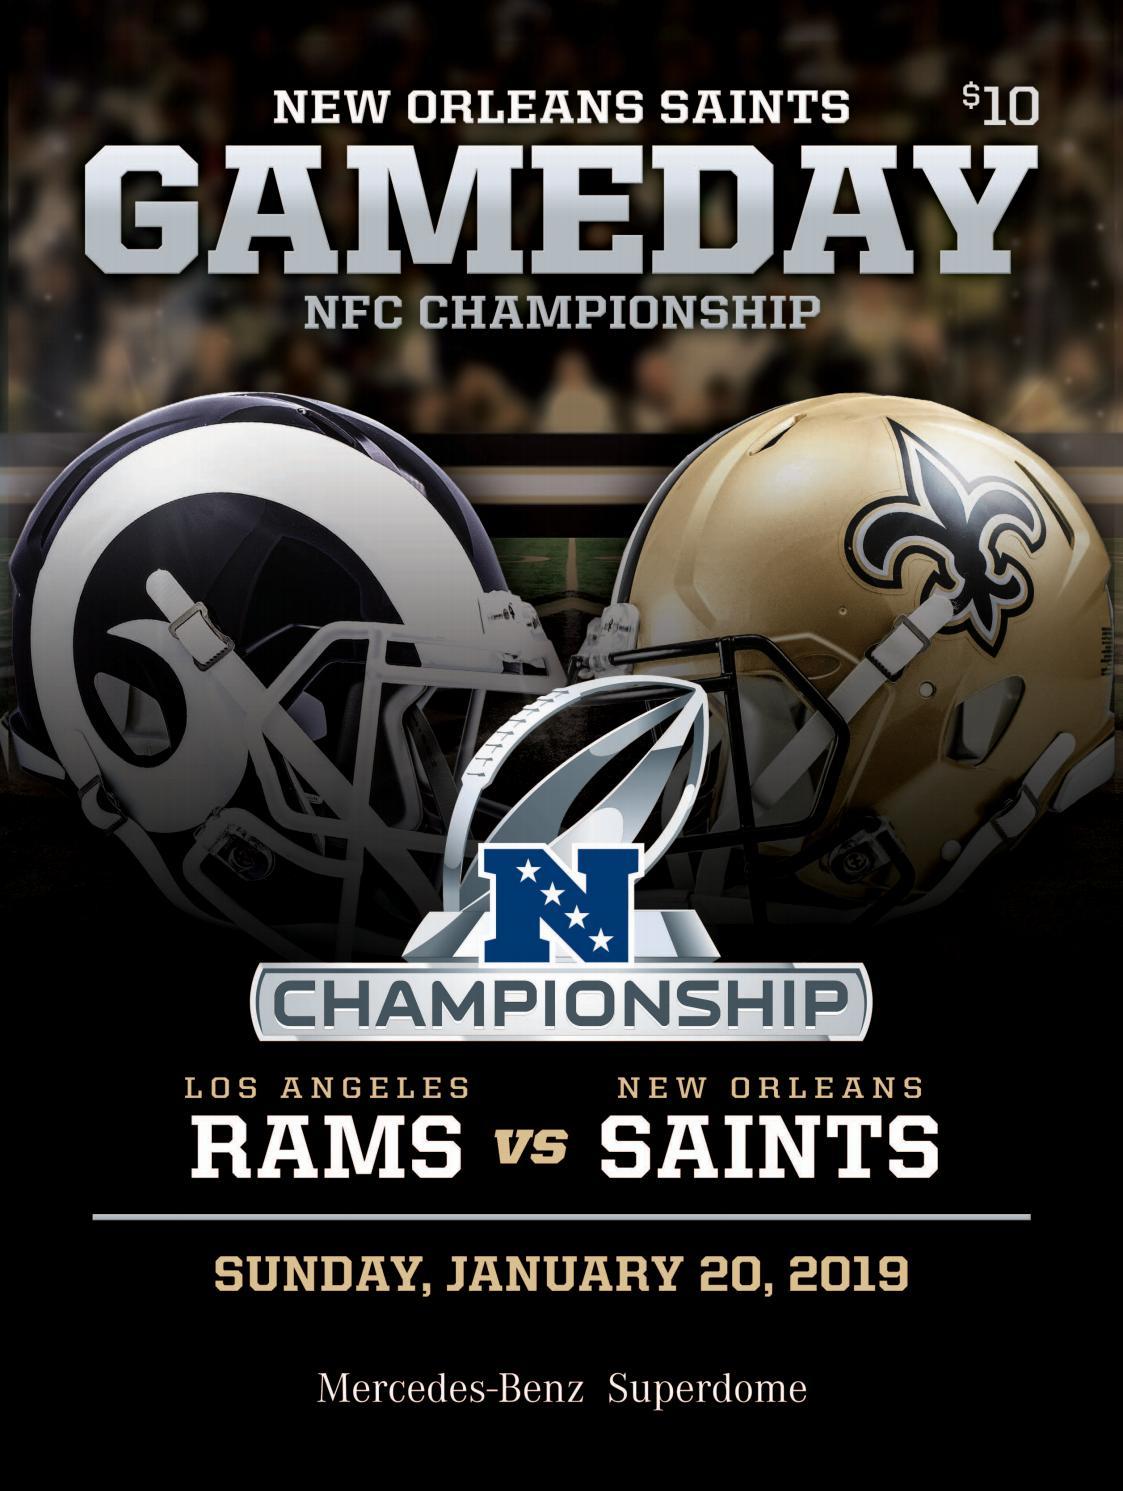 3367c1f5 New Orleans Saints Gameday | NFC CHAMPIONSHIP | Los Angeles Rams VS ...